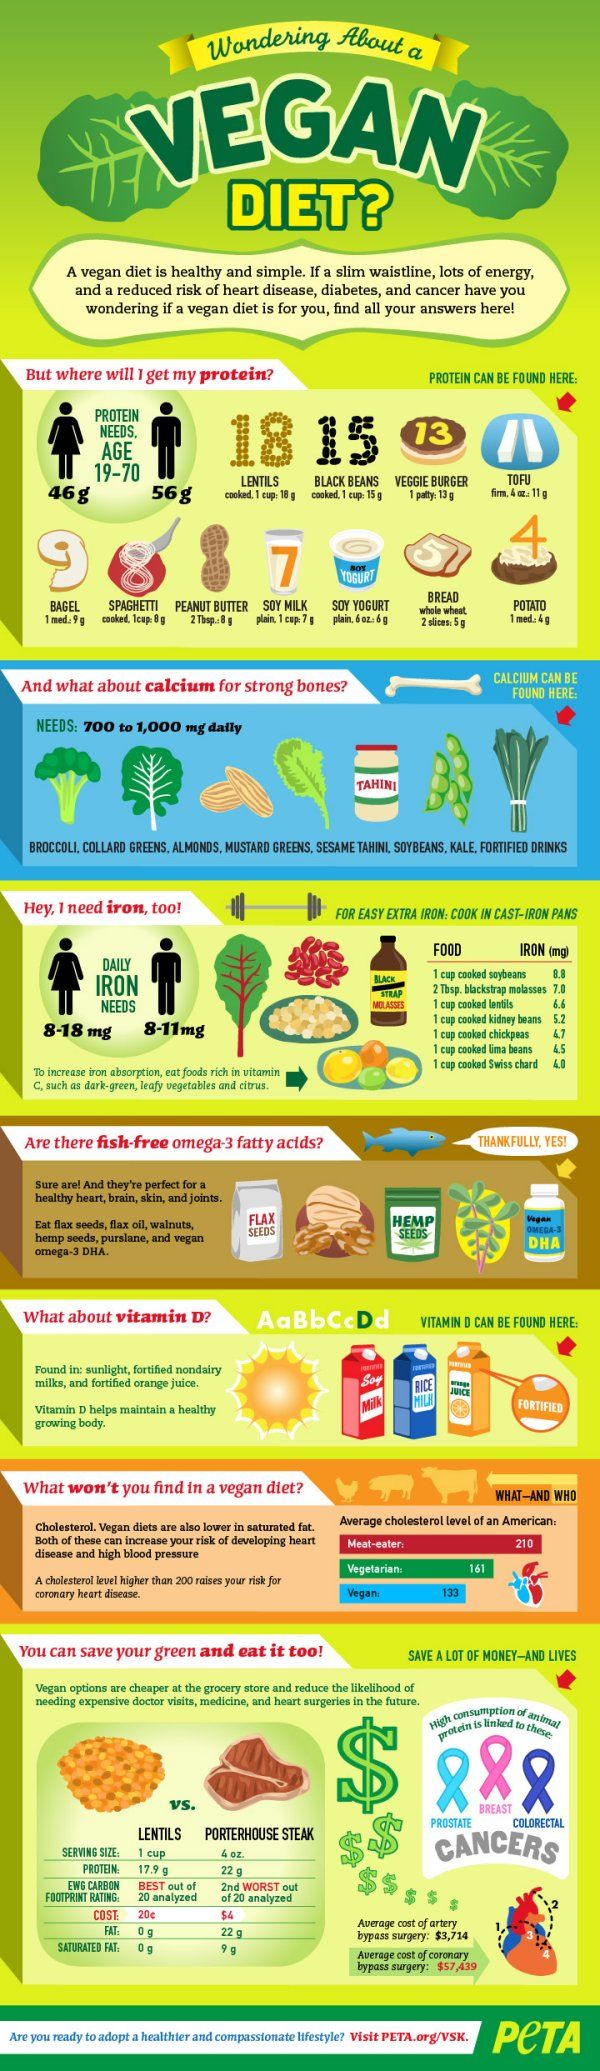 #Vegan Diet Food Options #Infographic